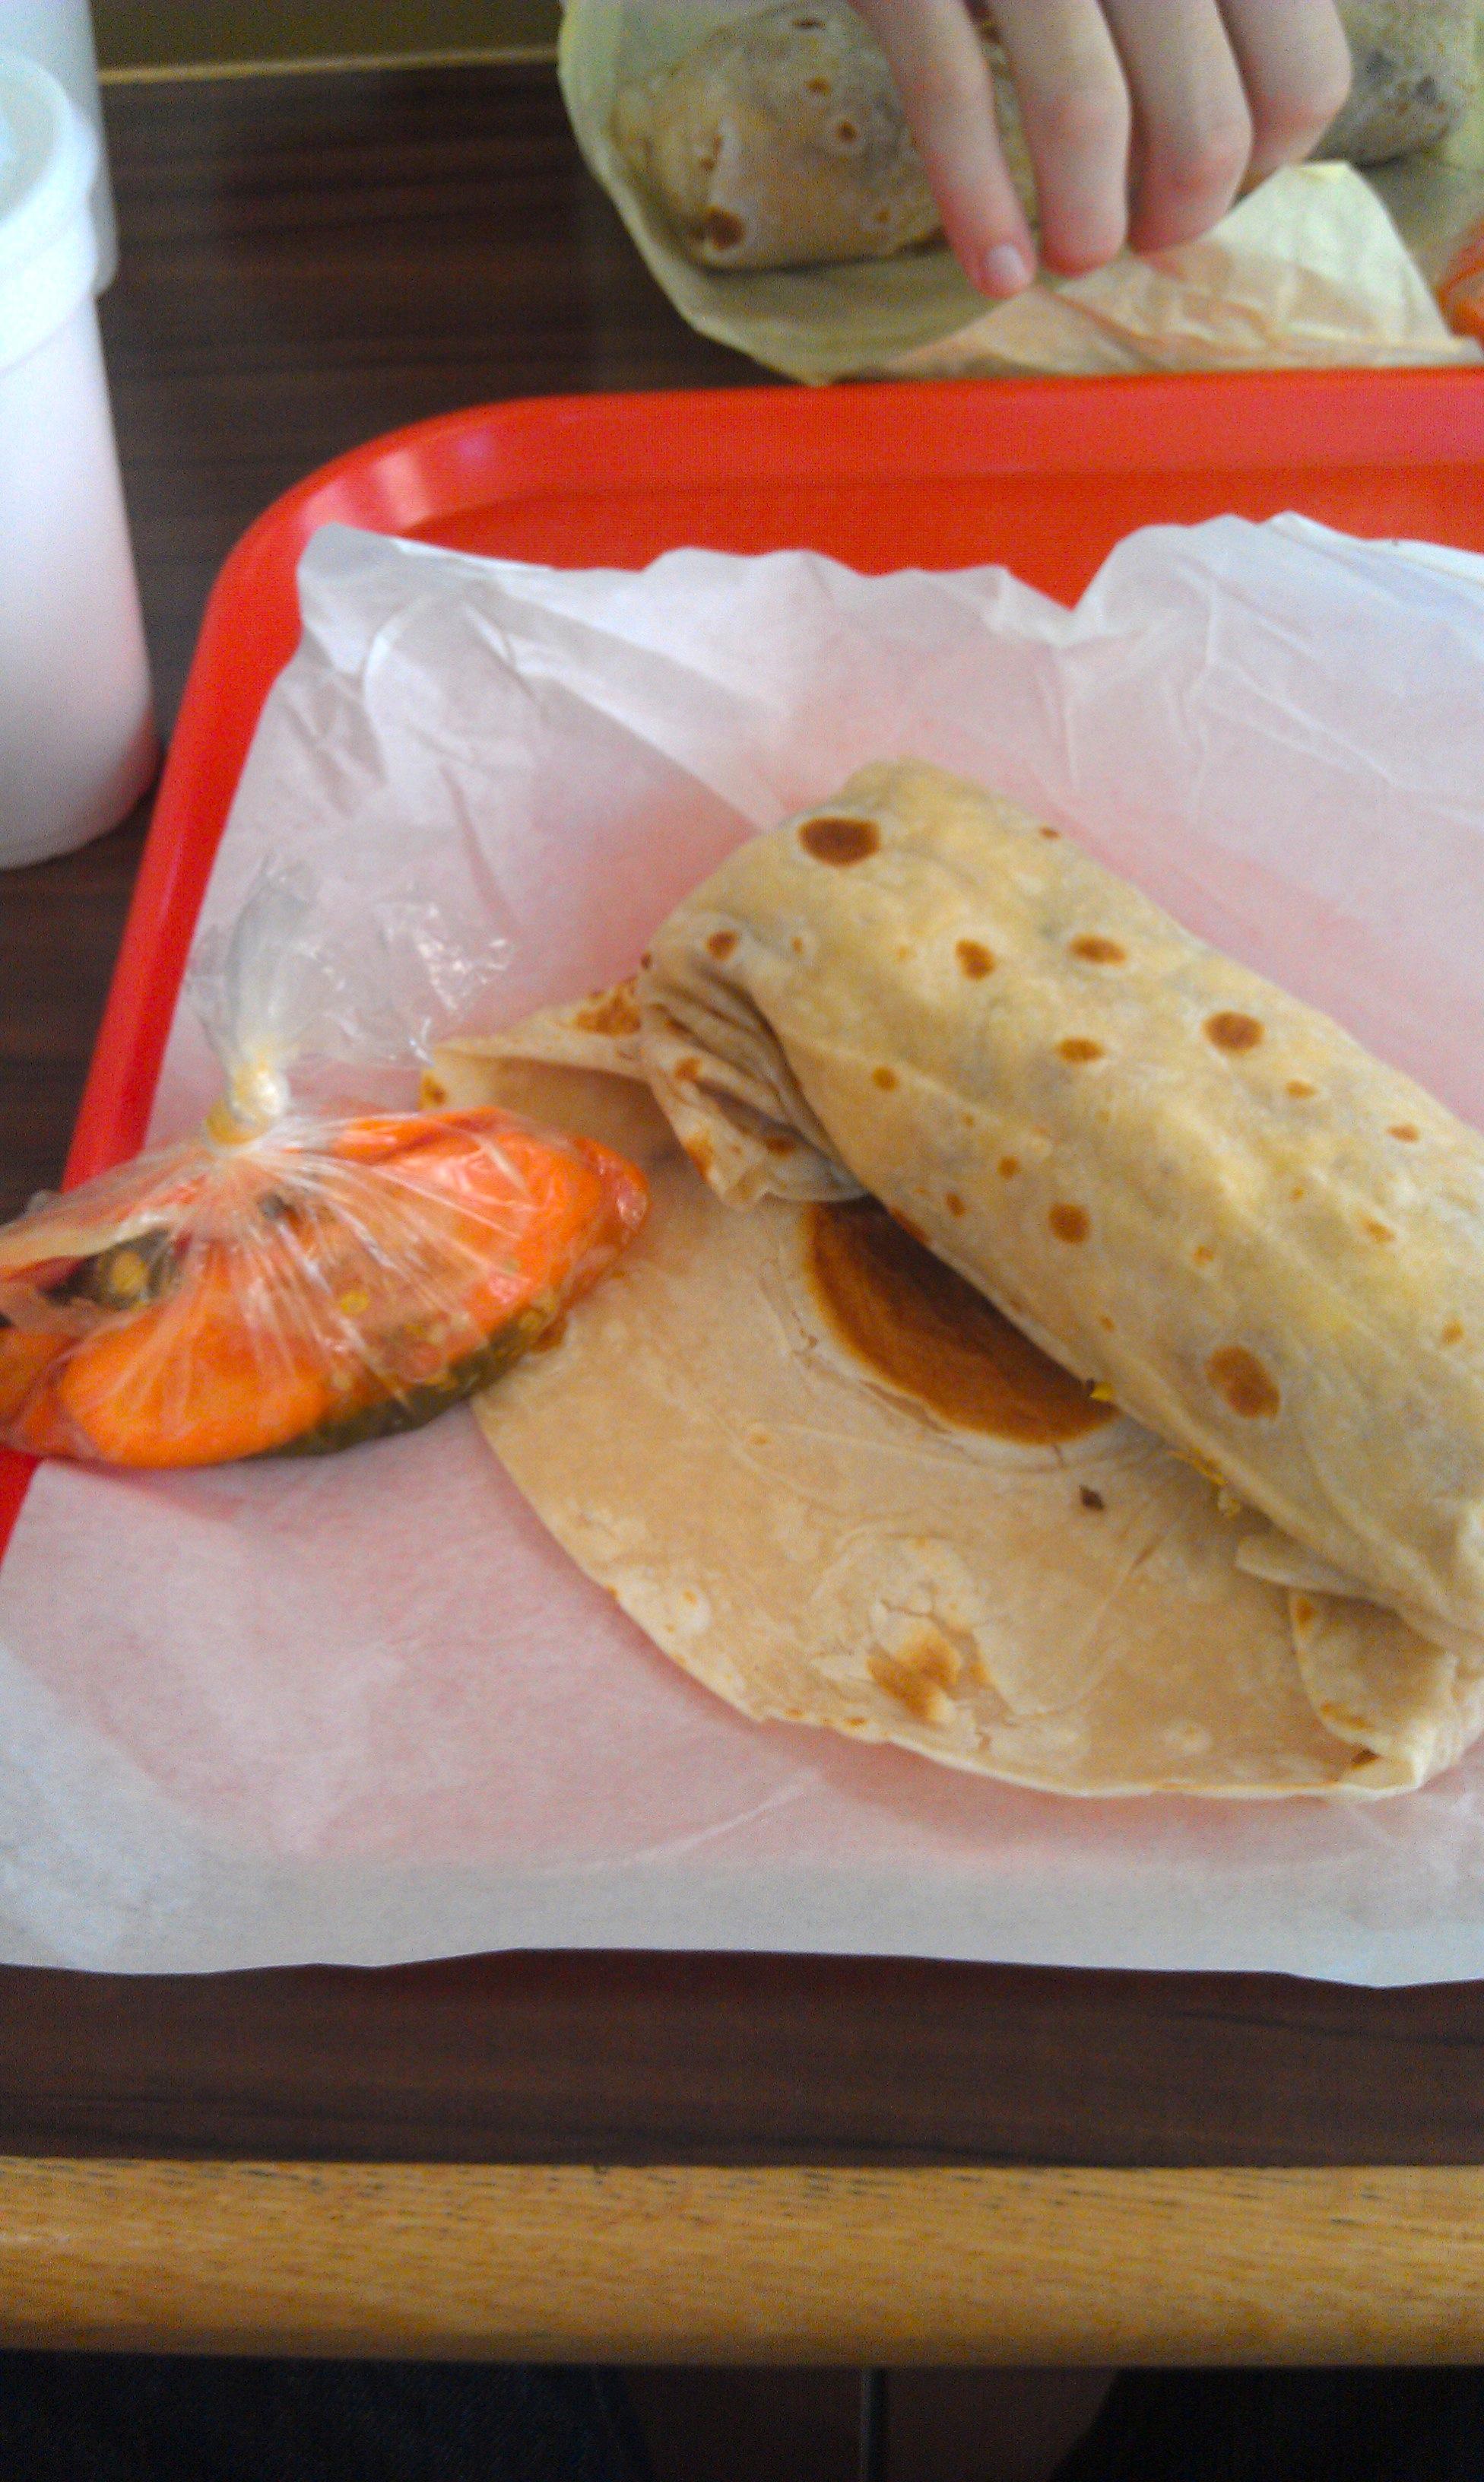 Breakfast Burrito and Carrots